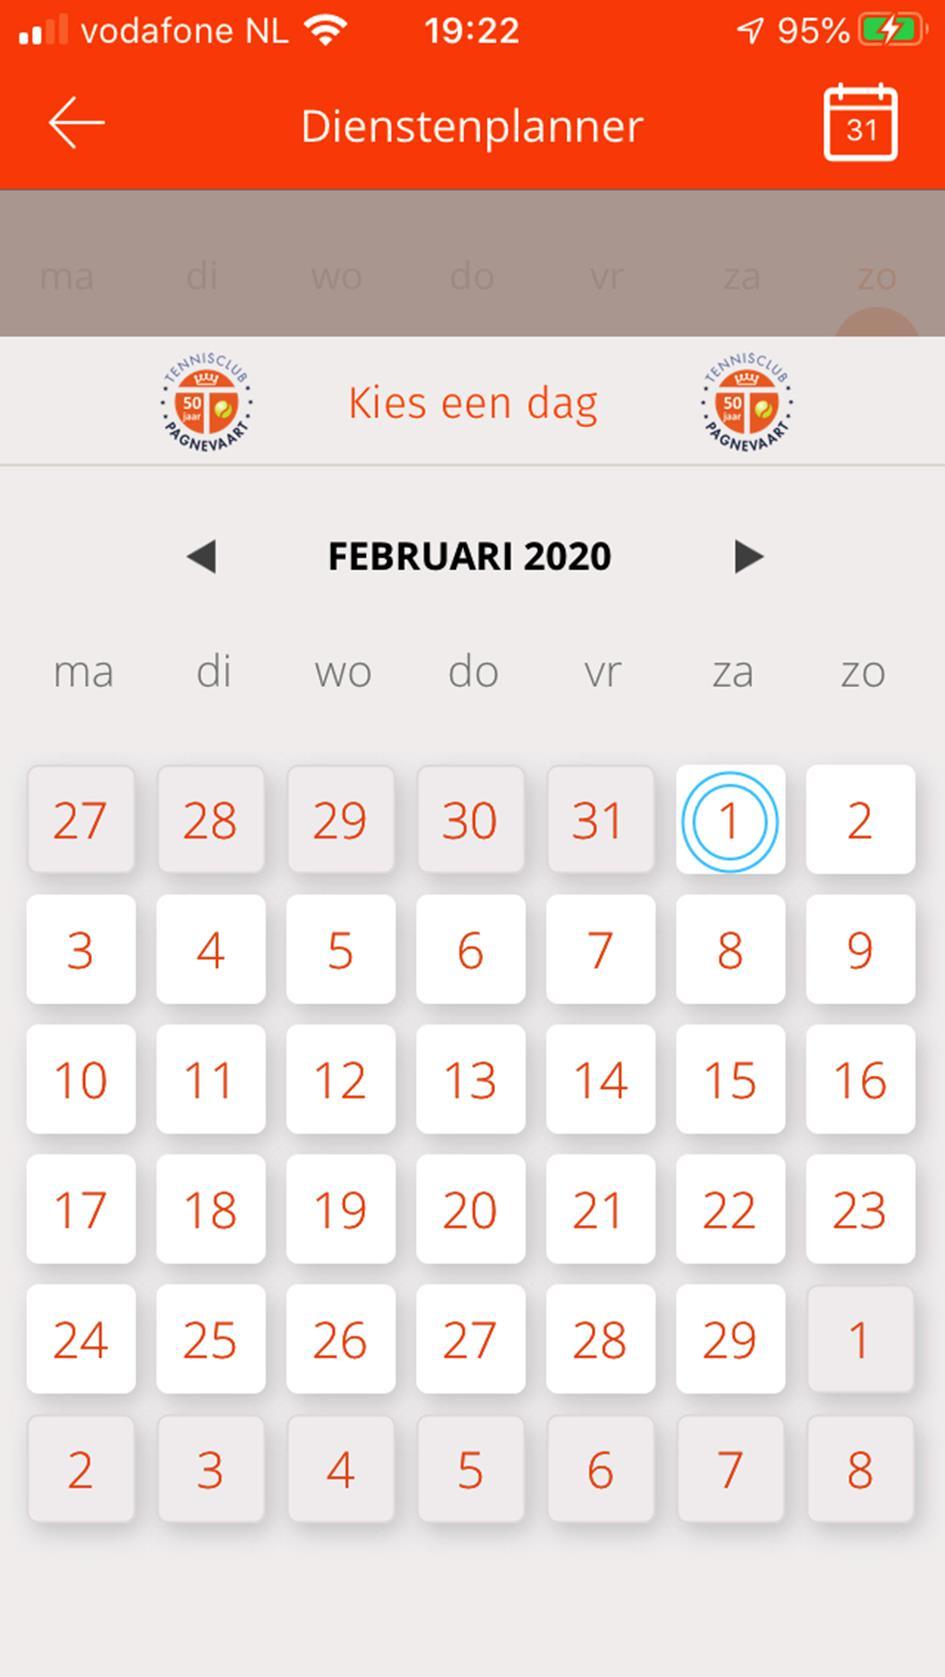 Dienstenplanner 2020.jpg